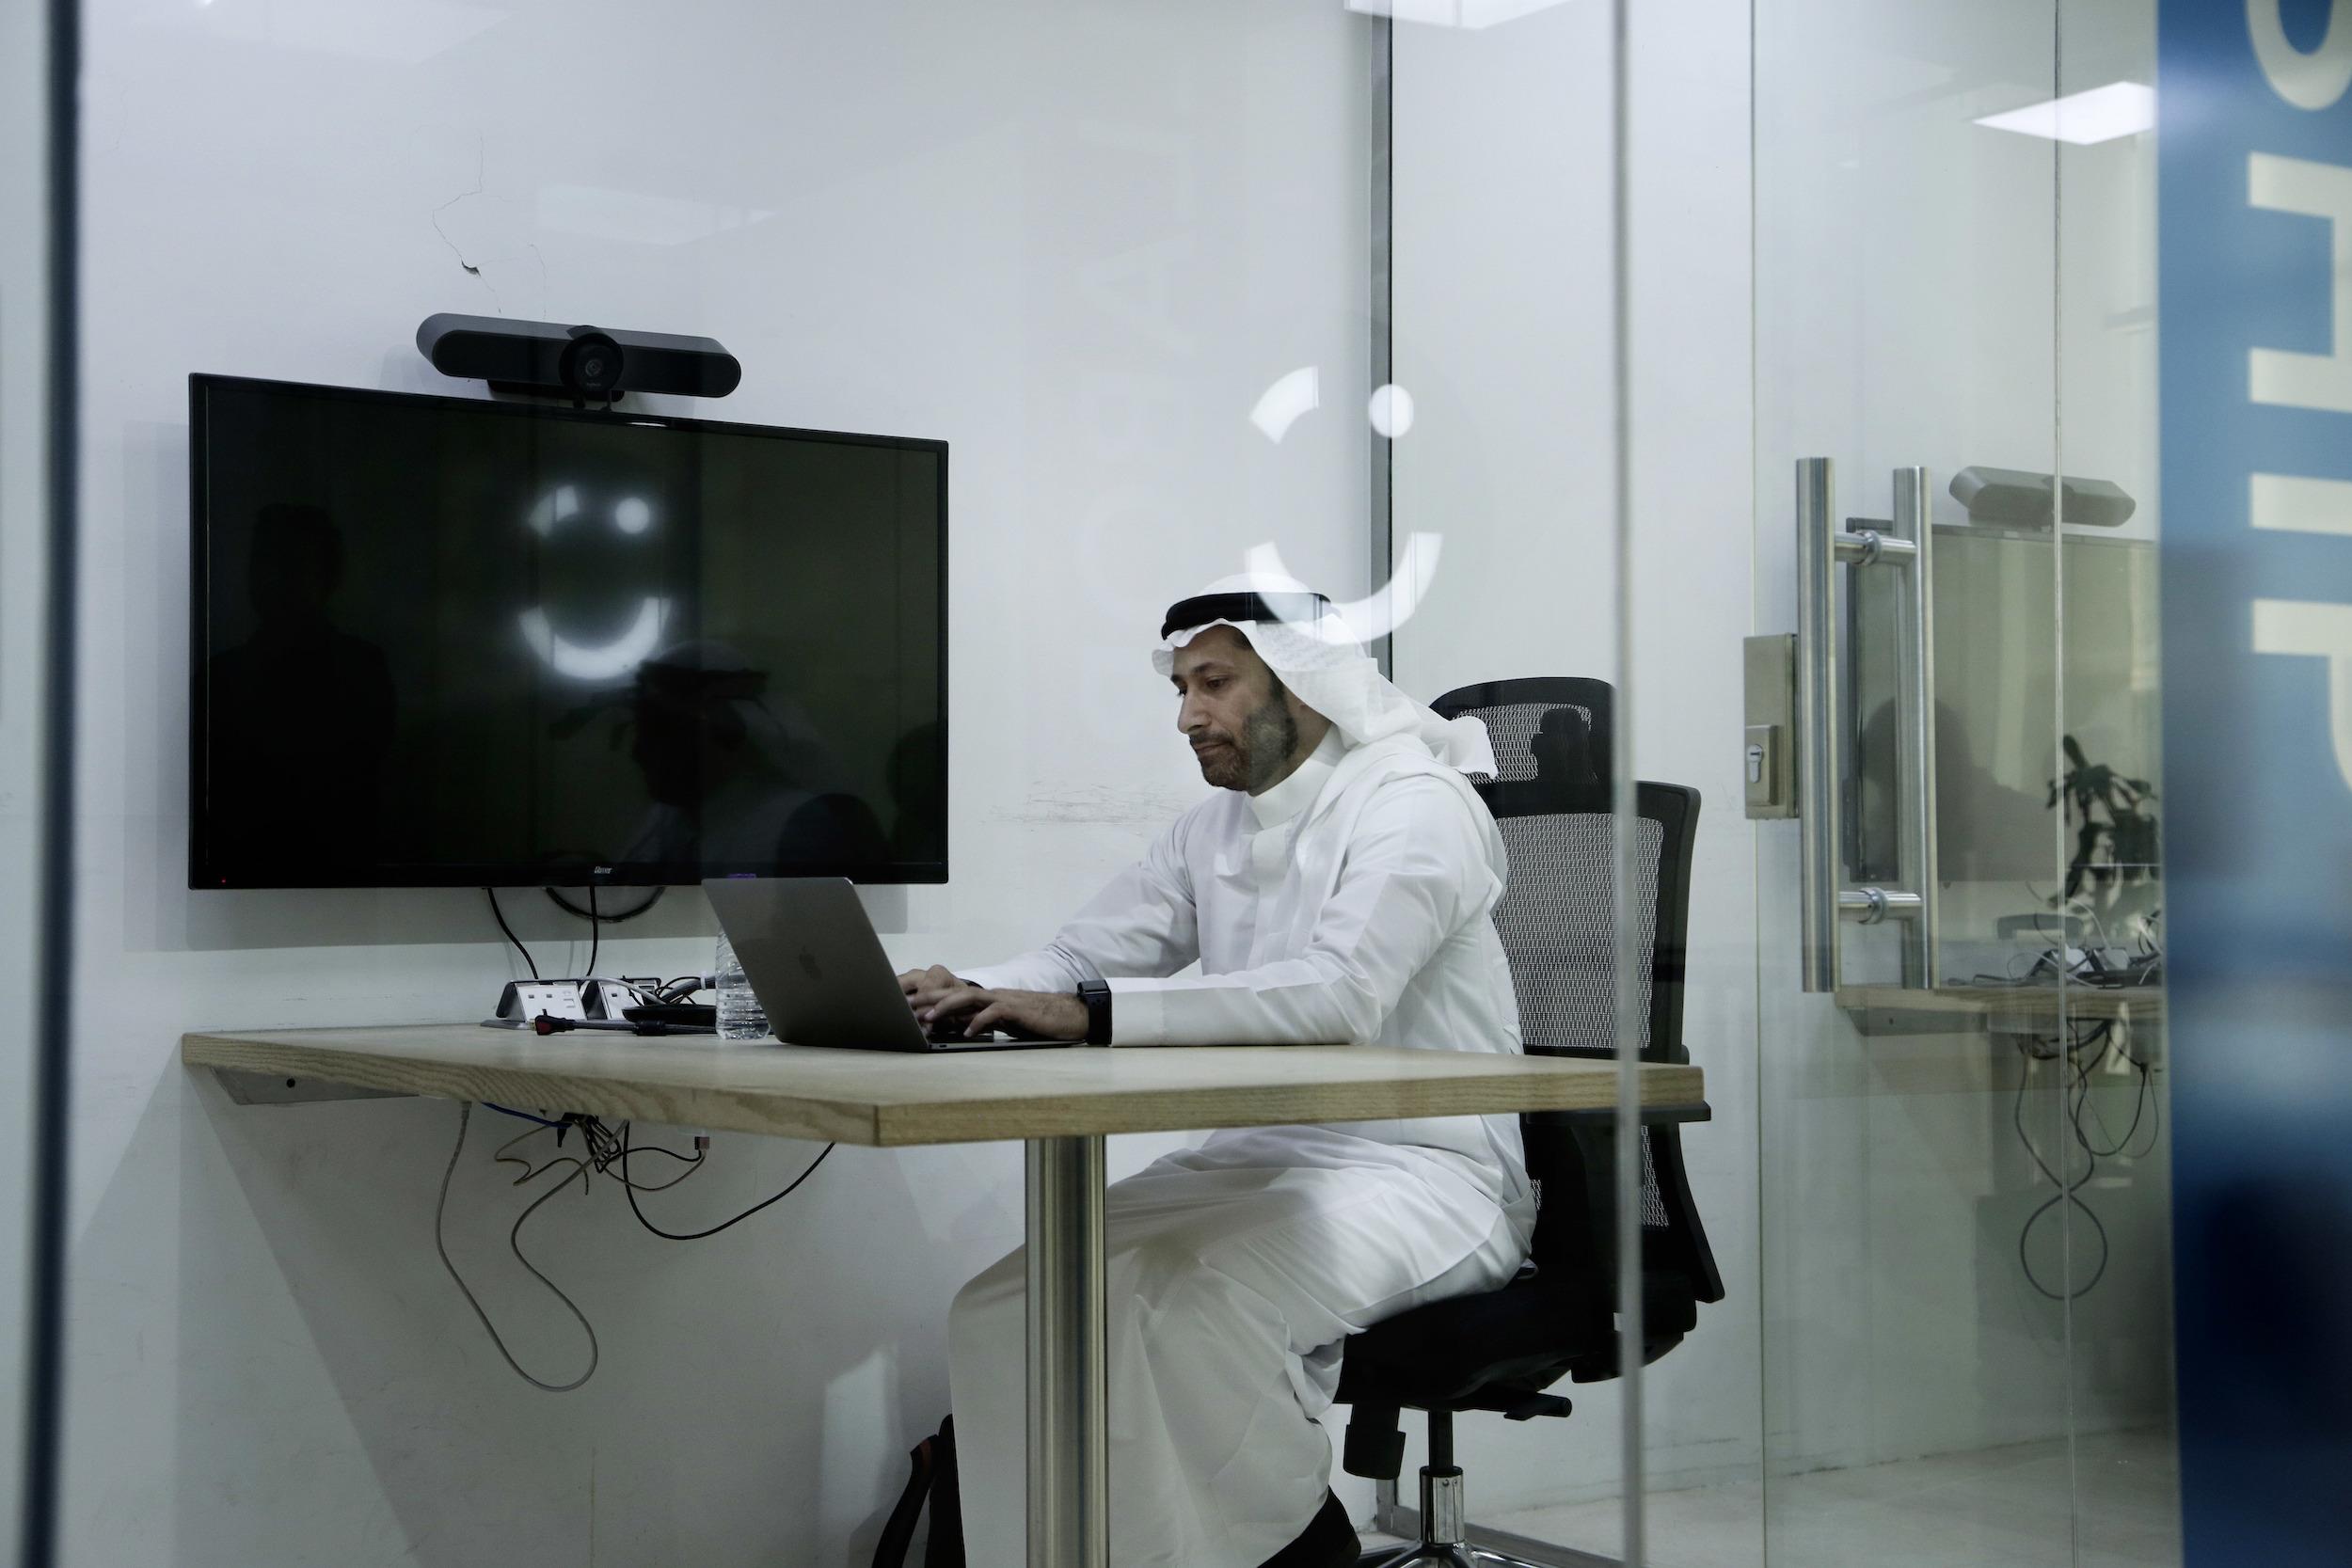 Careem co-founder Abdullah Elyas sits at a desk at Careem's office in Riyadh, Saudi Arabia, June 24, 2018. (AP Photo/Nariman El-Mofty)